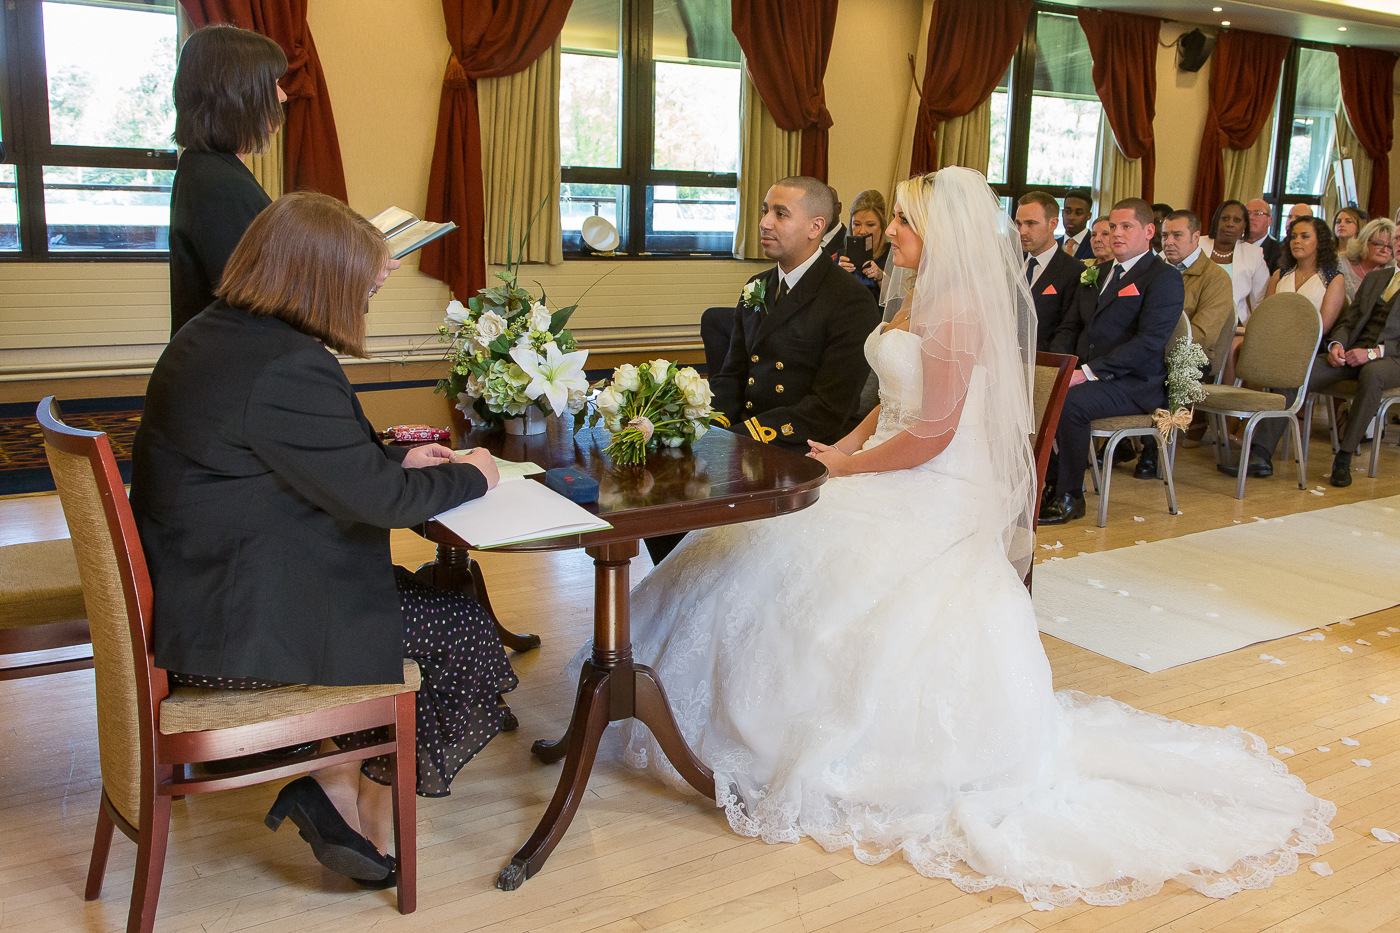 Ceremony-Pat-7388.jpg